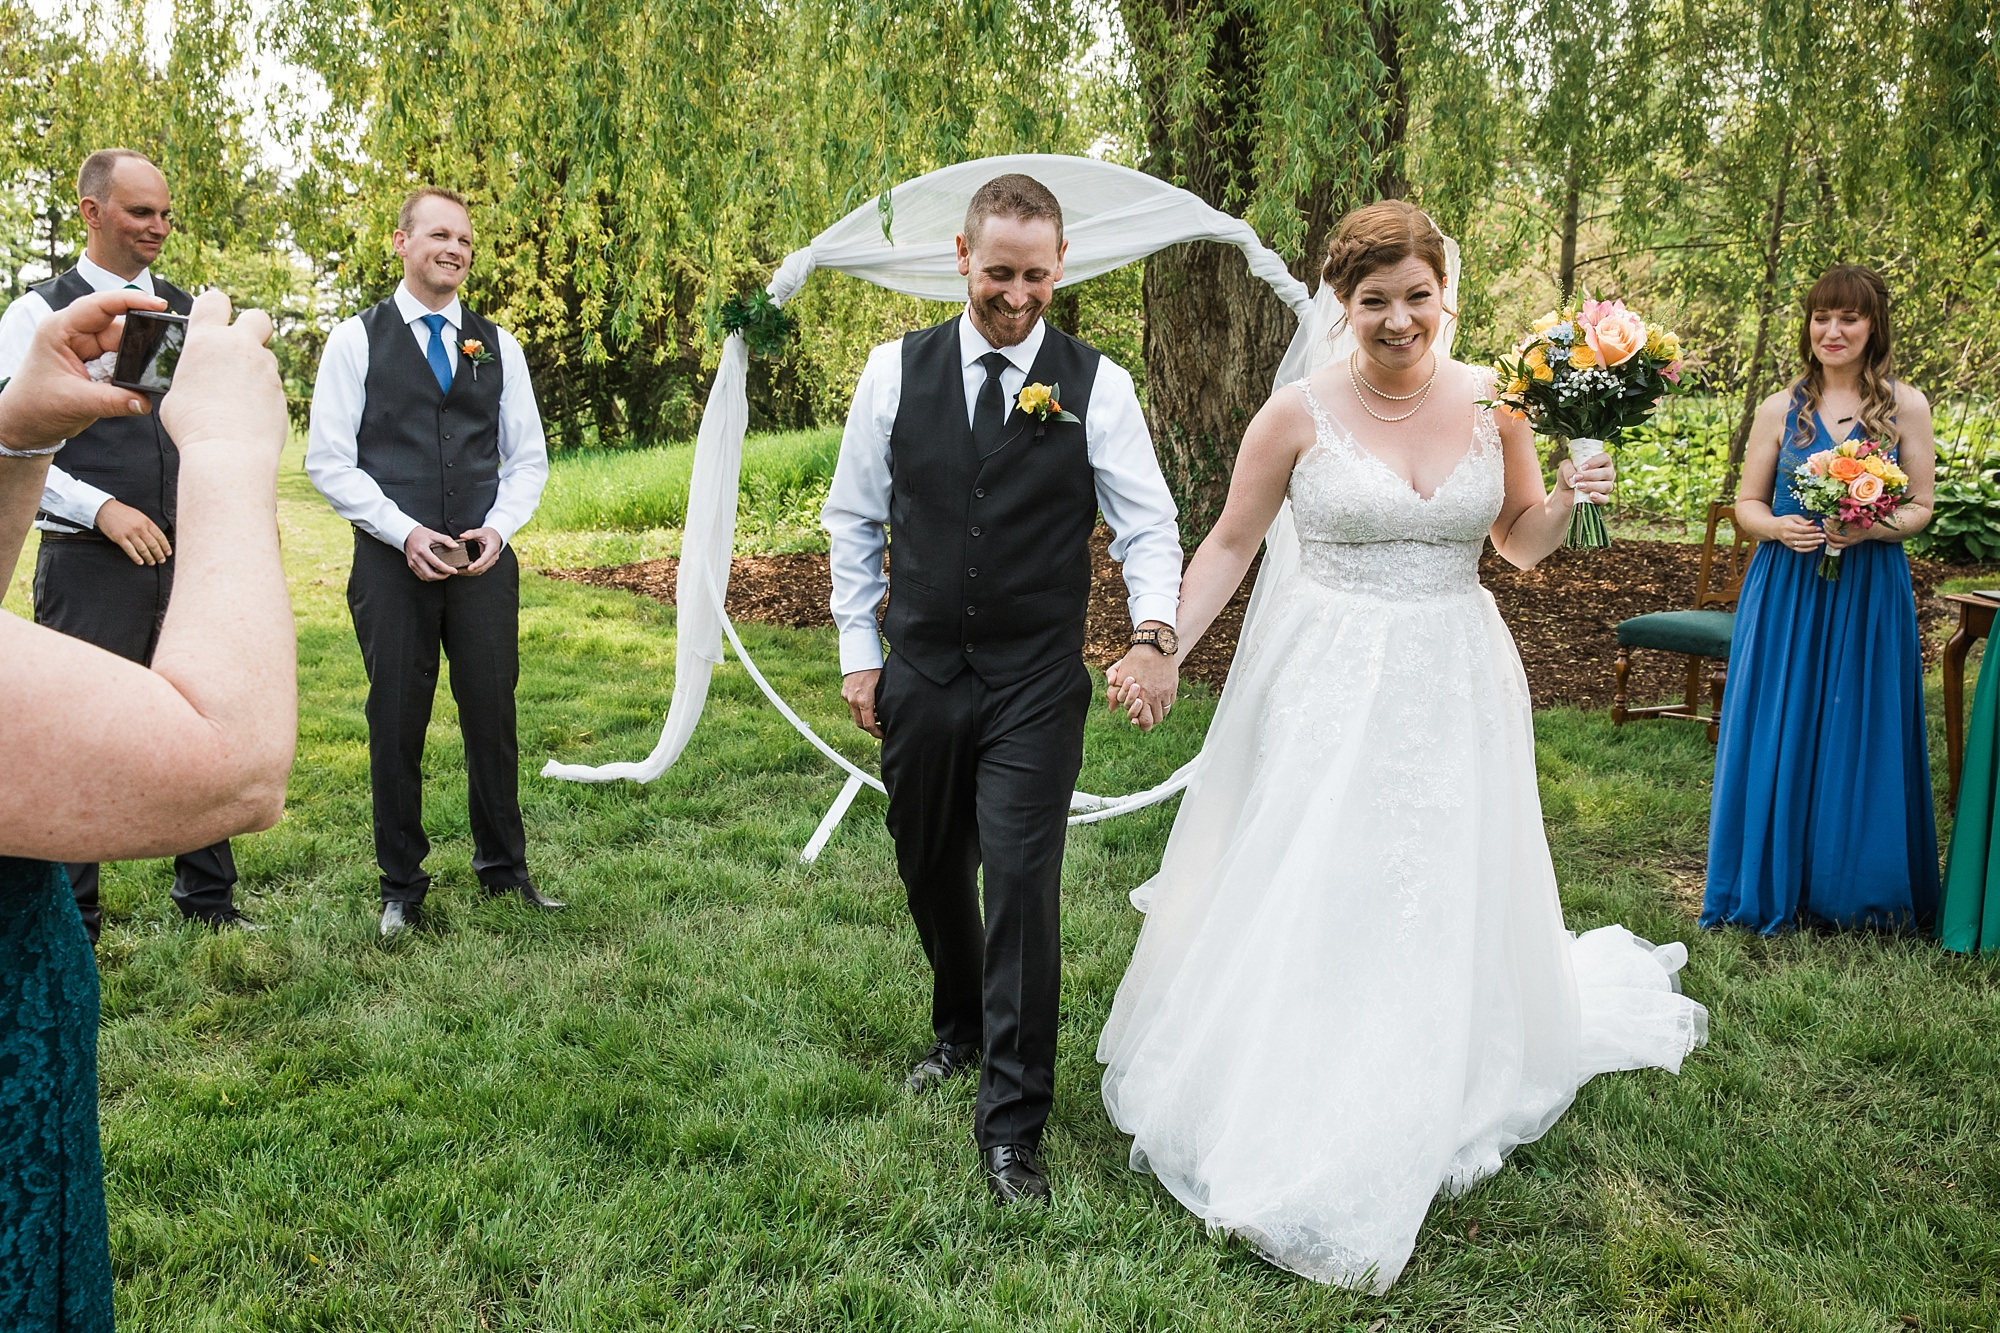 niagarafalls-weddingphotography_0022.jpg